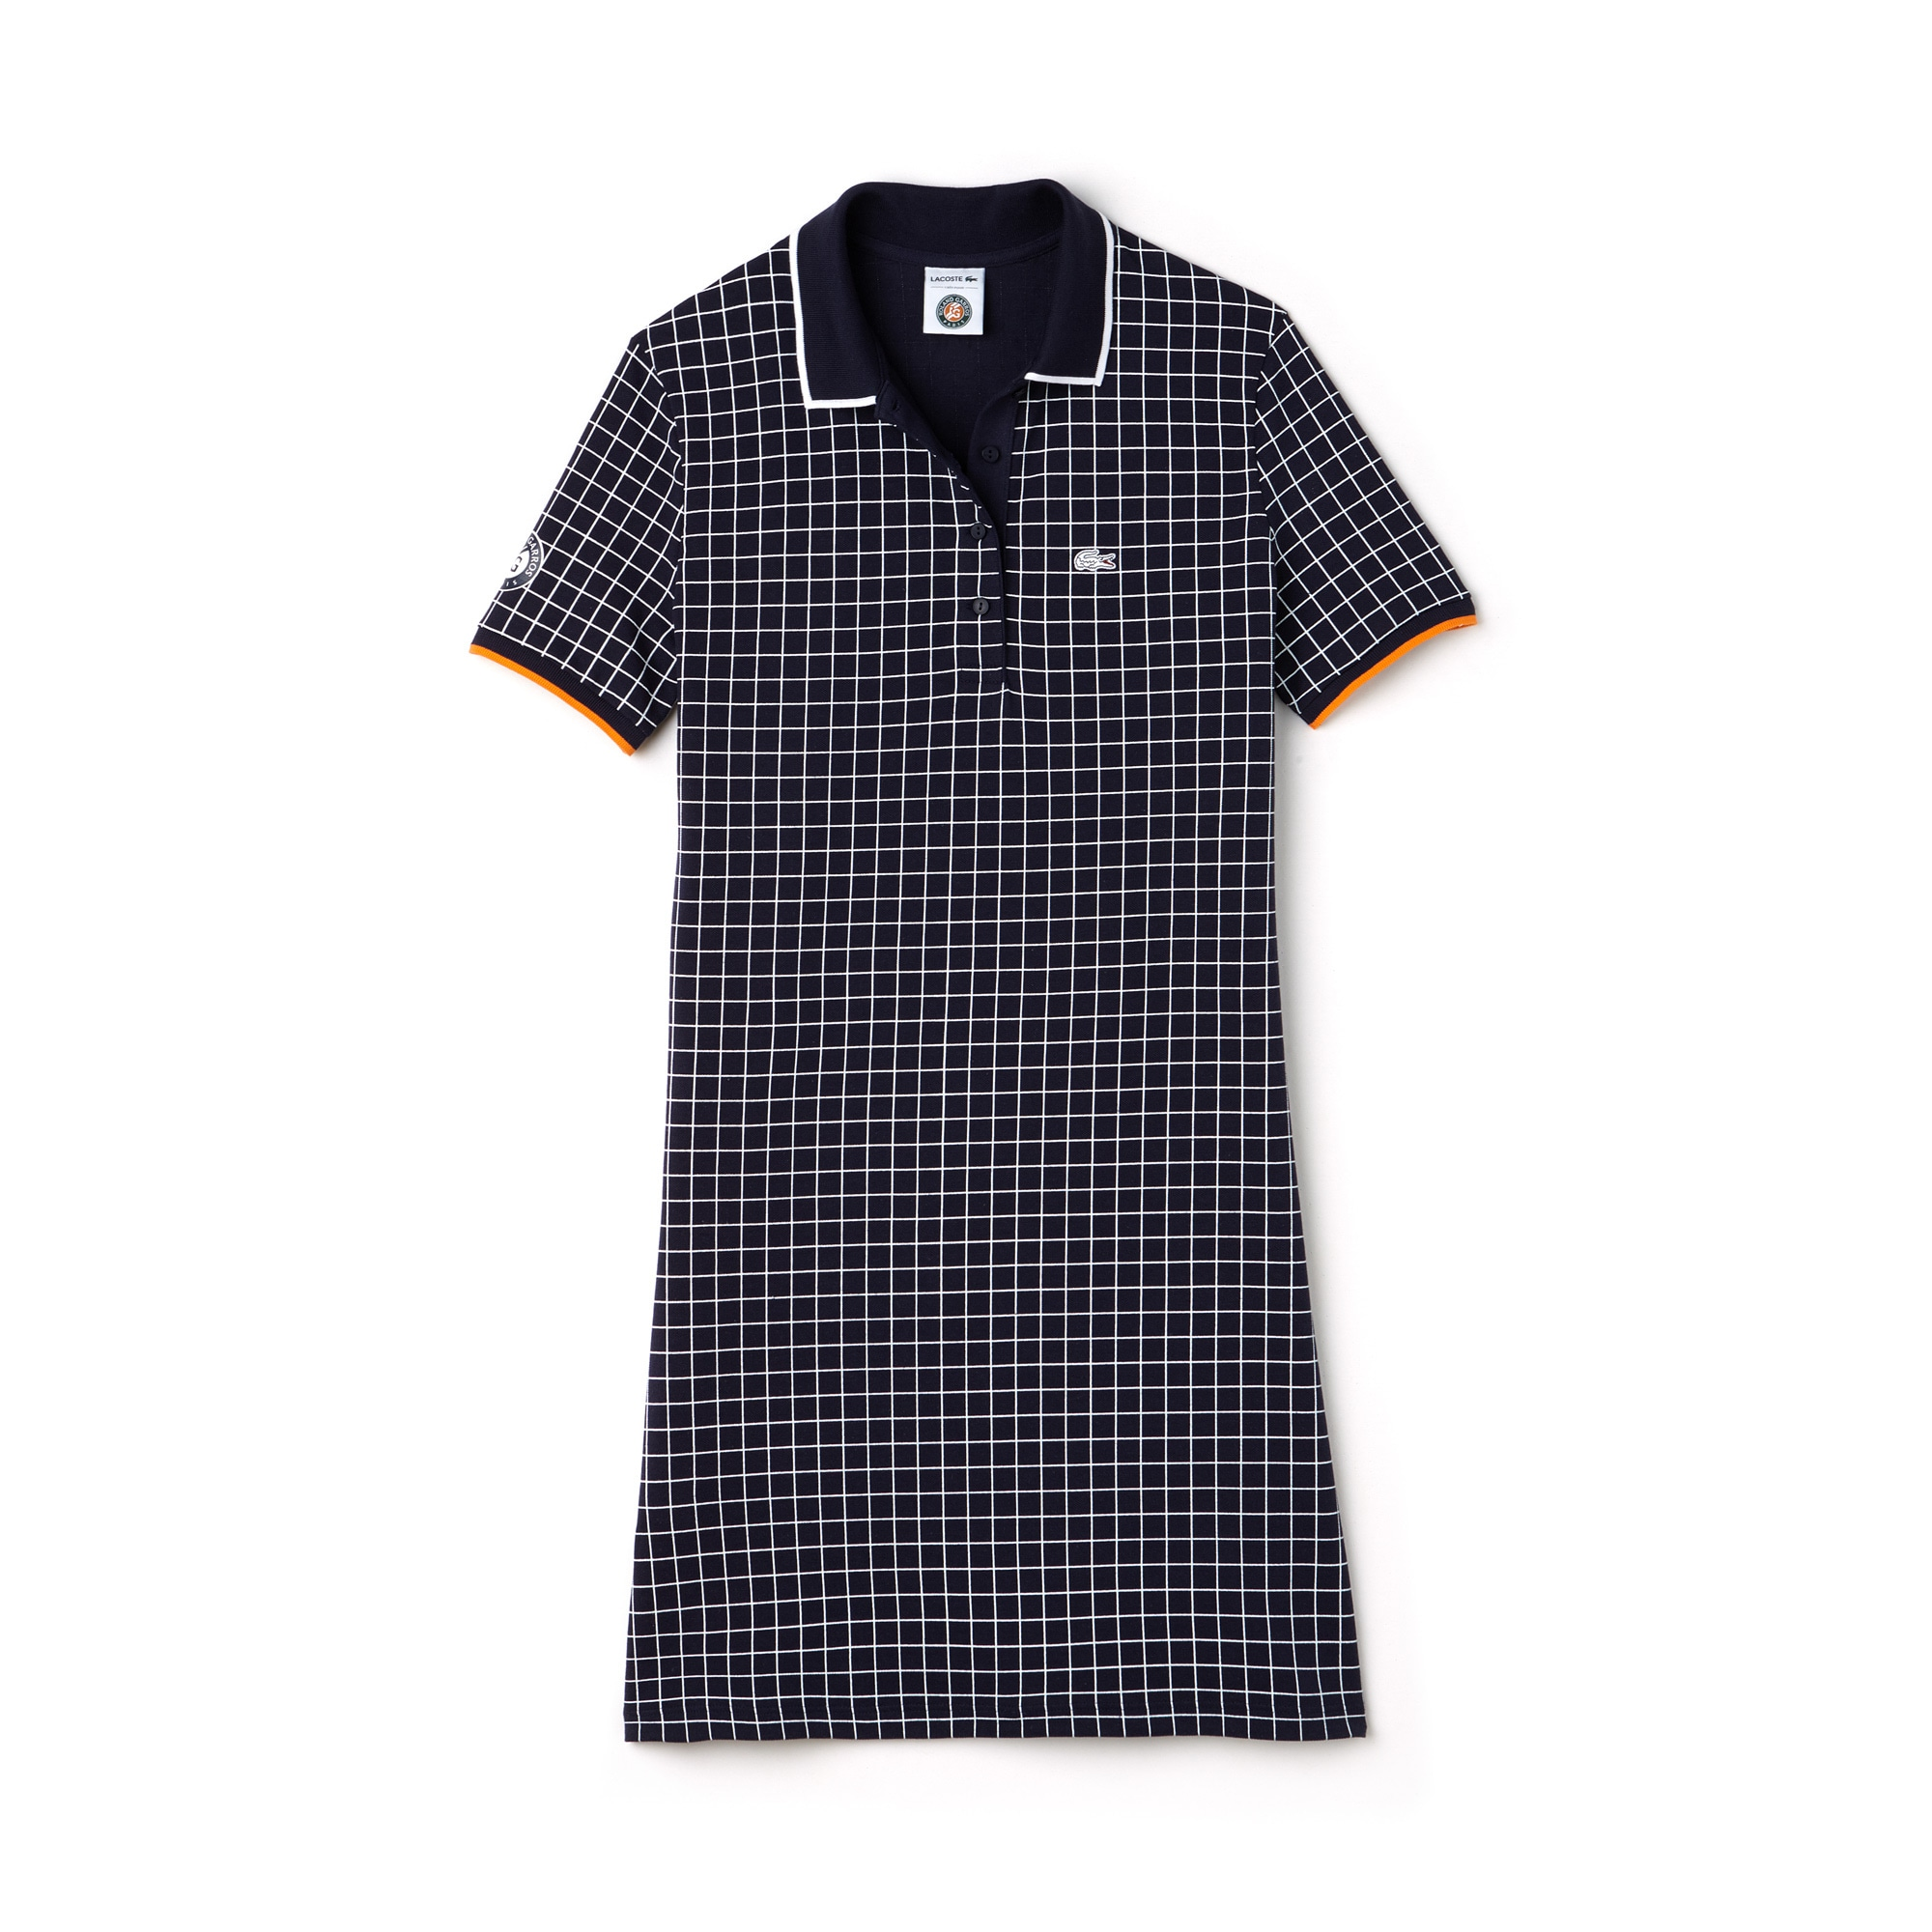 Vestido polo Lacoste SPORT de mini piqué estampado Edición Roland Garros